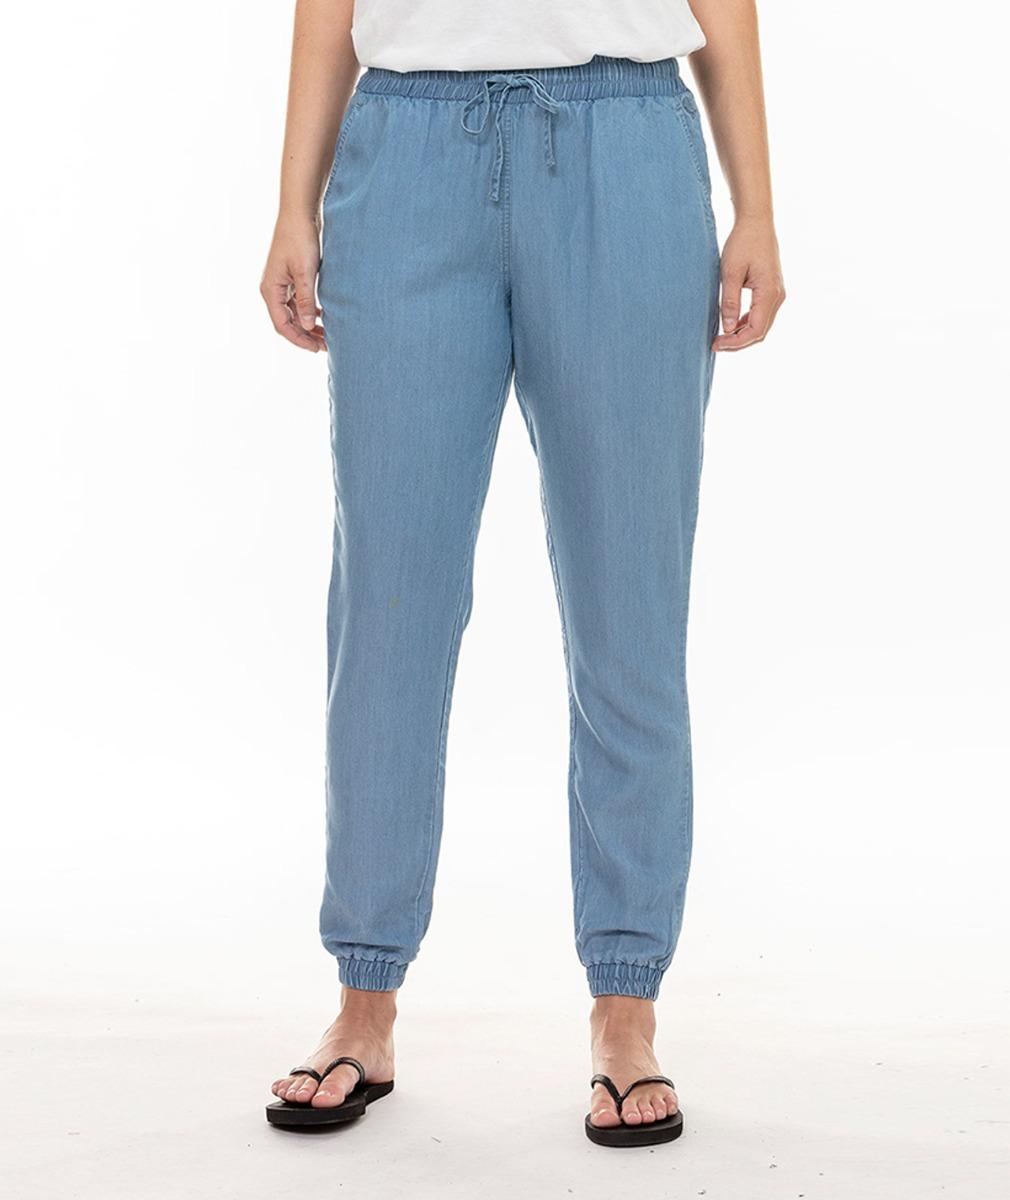 Swanndri Women Sumner Cuffed Pants